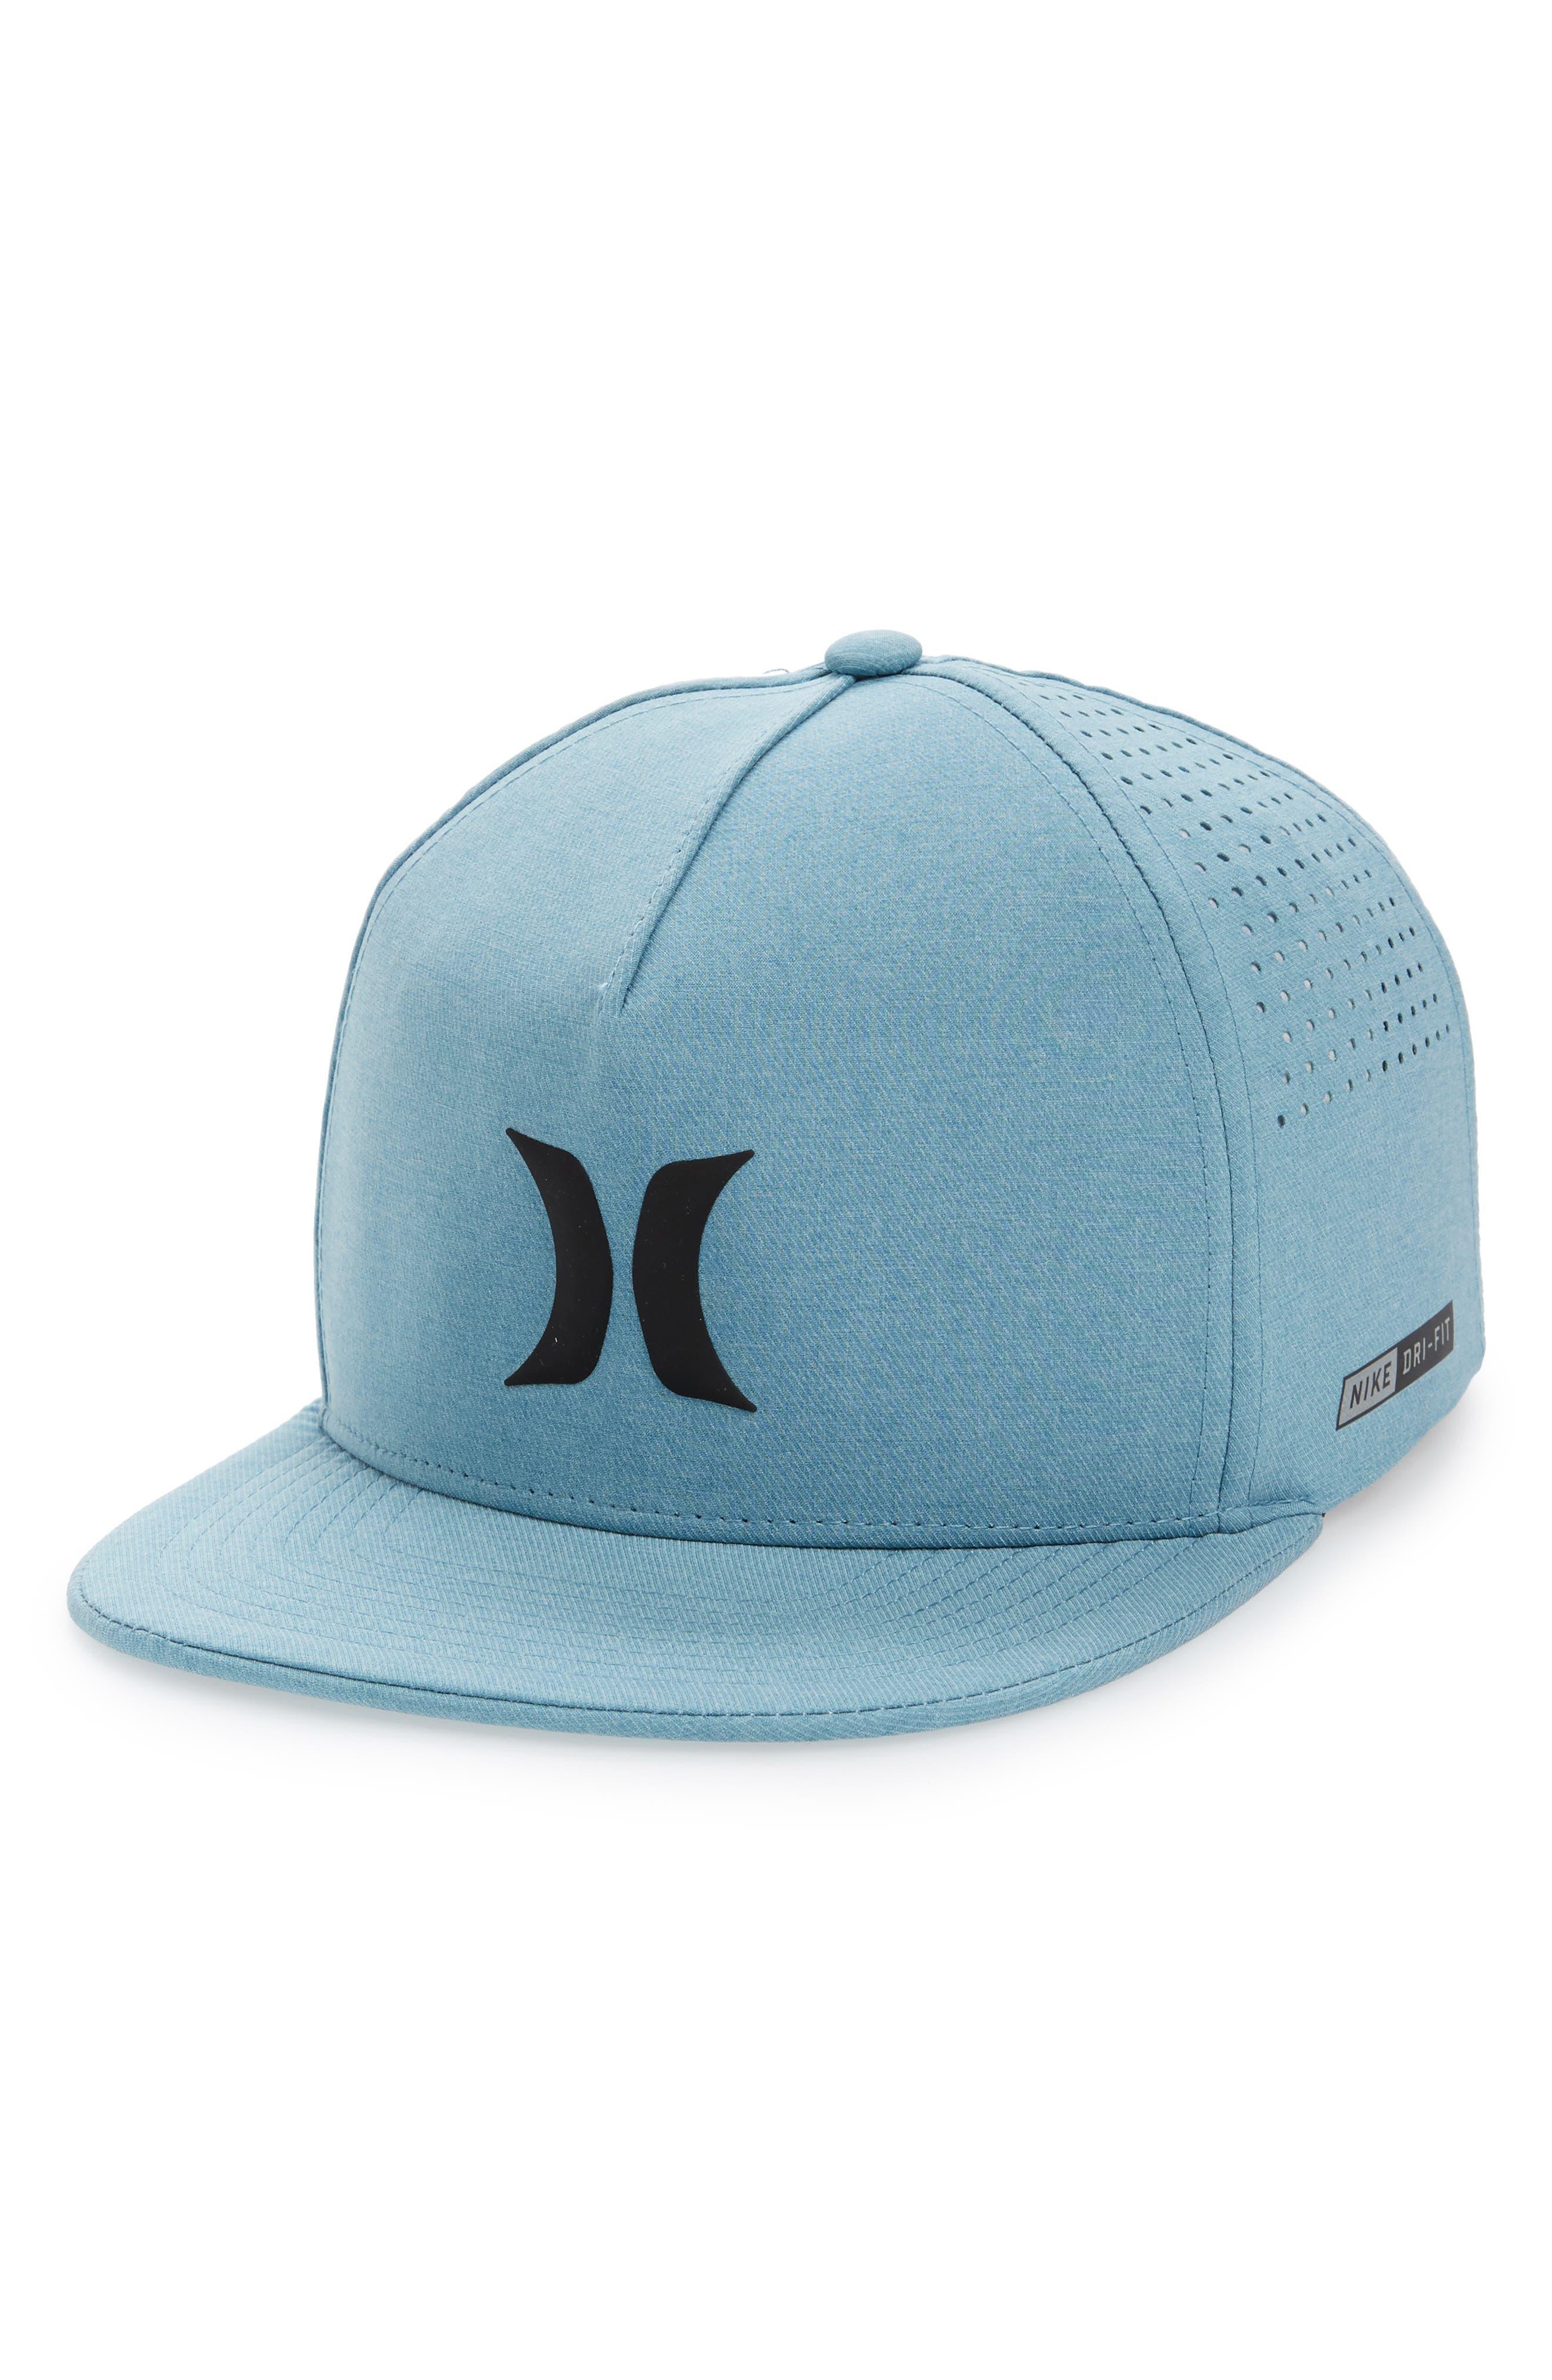 Hurley Dri-FIT Icon Snapback Baseball Cap